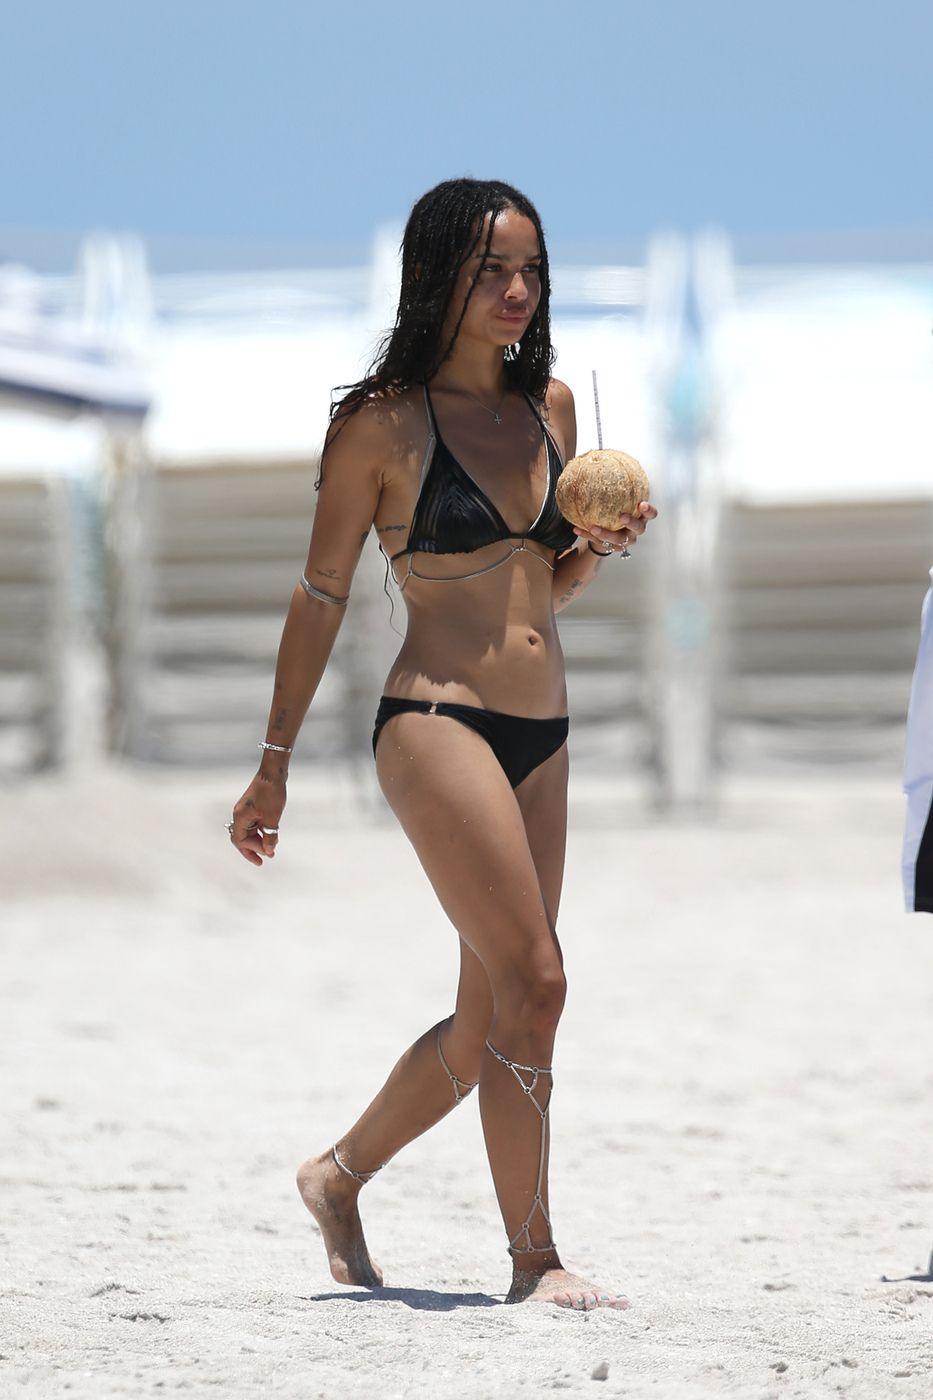 Zoe-Kravitz-in-a-Bikini-2